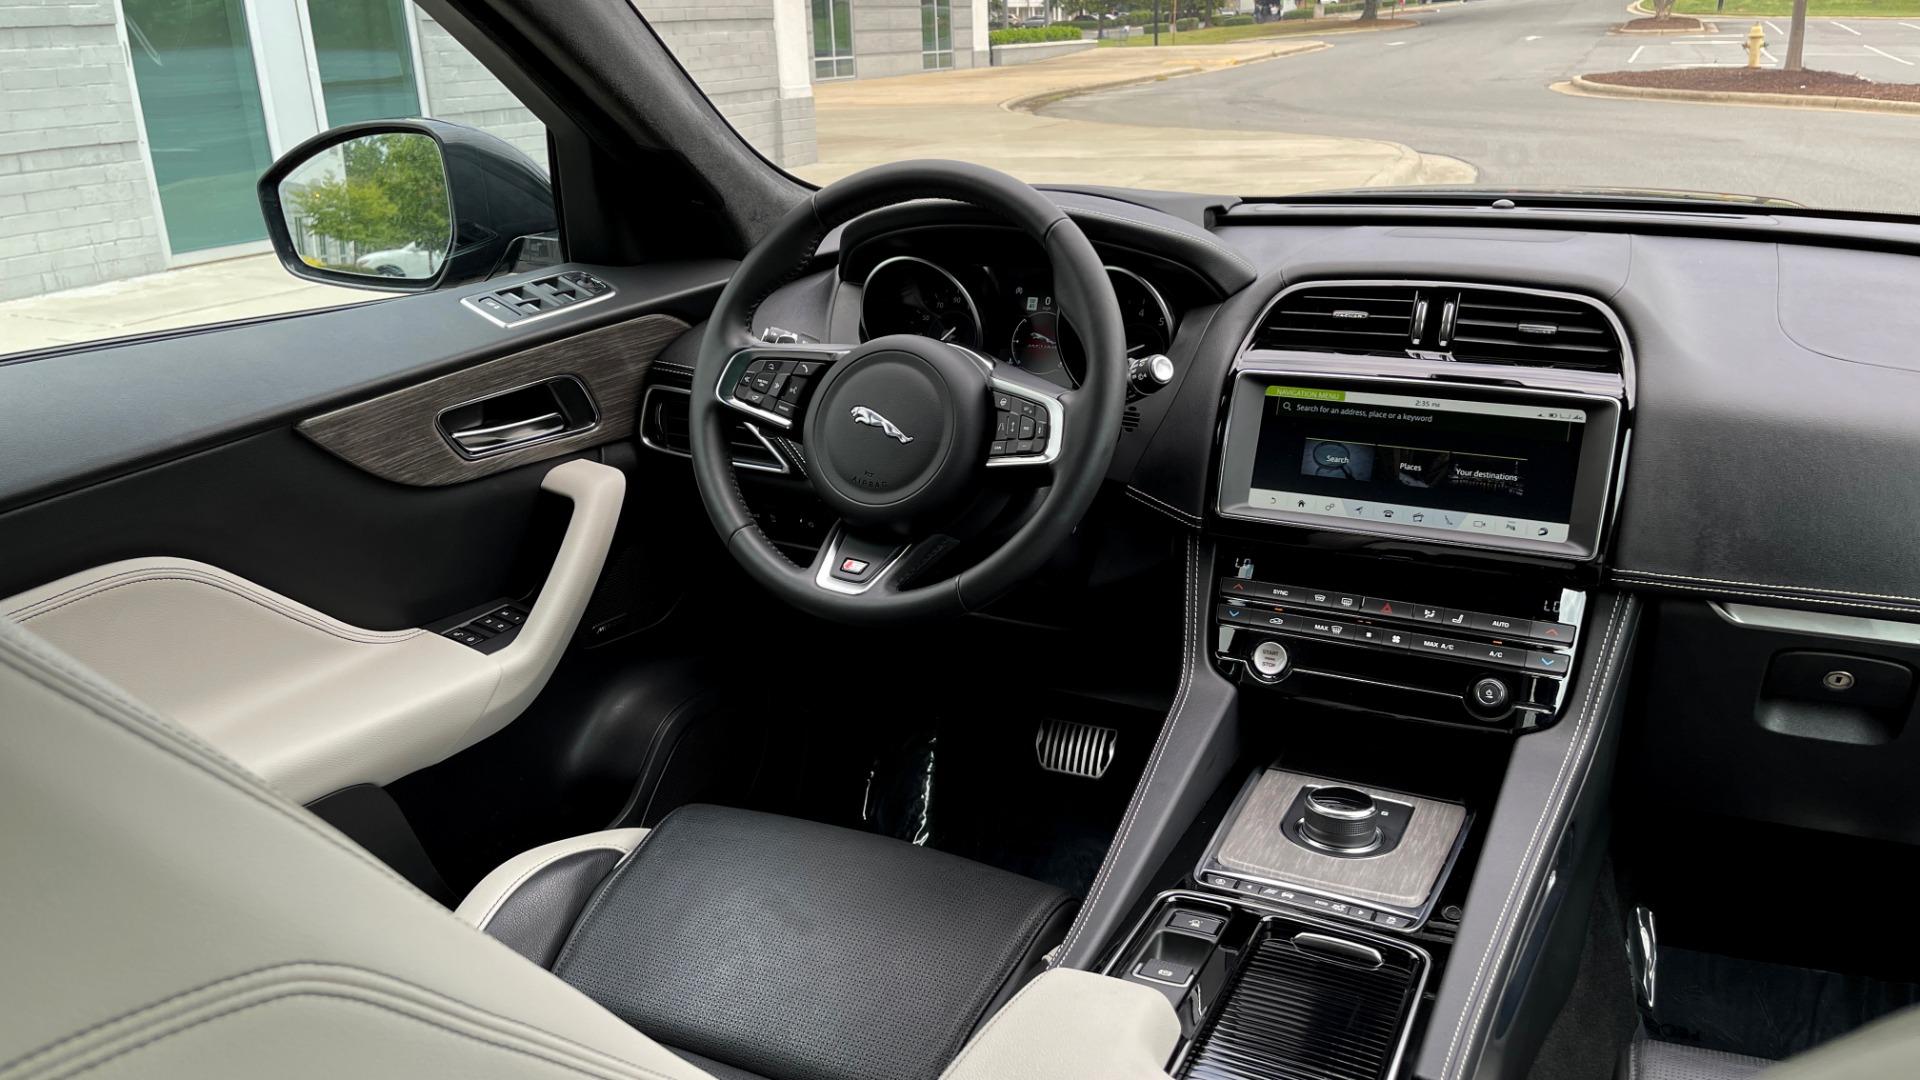 Used 2019 Jaguar F-PACE S / DRIVE PKG / BSA / HUD / BLACK EXT PKG / REARVIEW for sale $50,995 at Formula Imports in Charlotte NC 28227 56